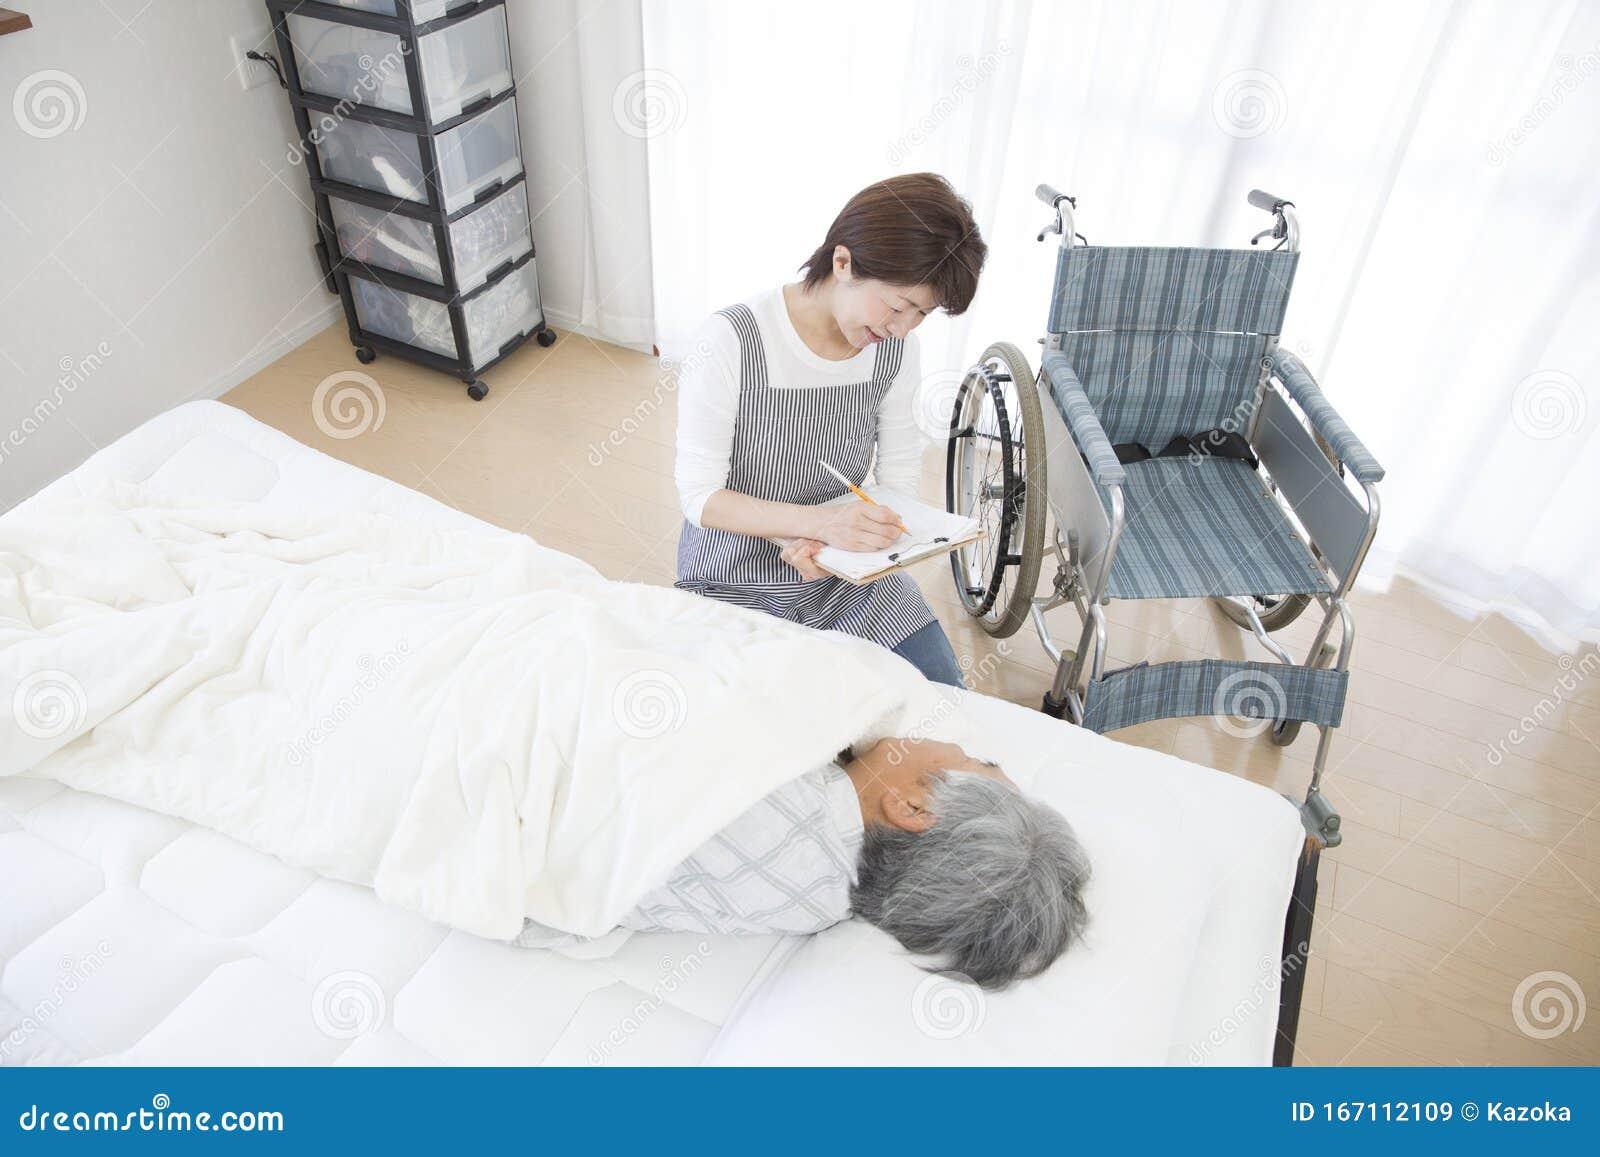 Home Care Inquiring Female Helper Stock Image Image Of People Indoor 167112109